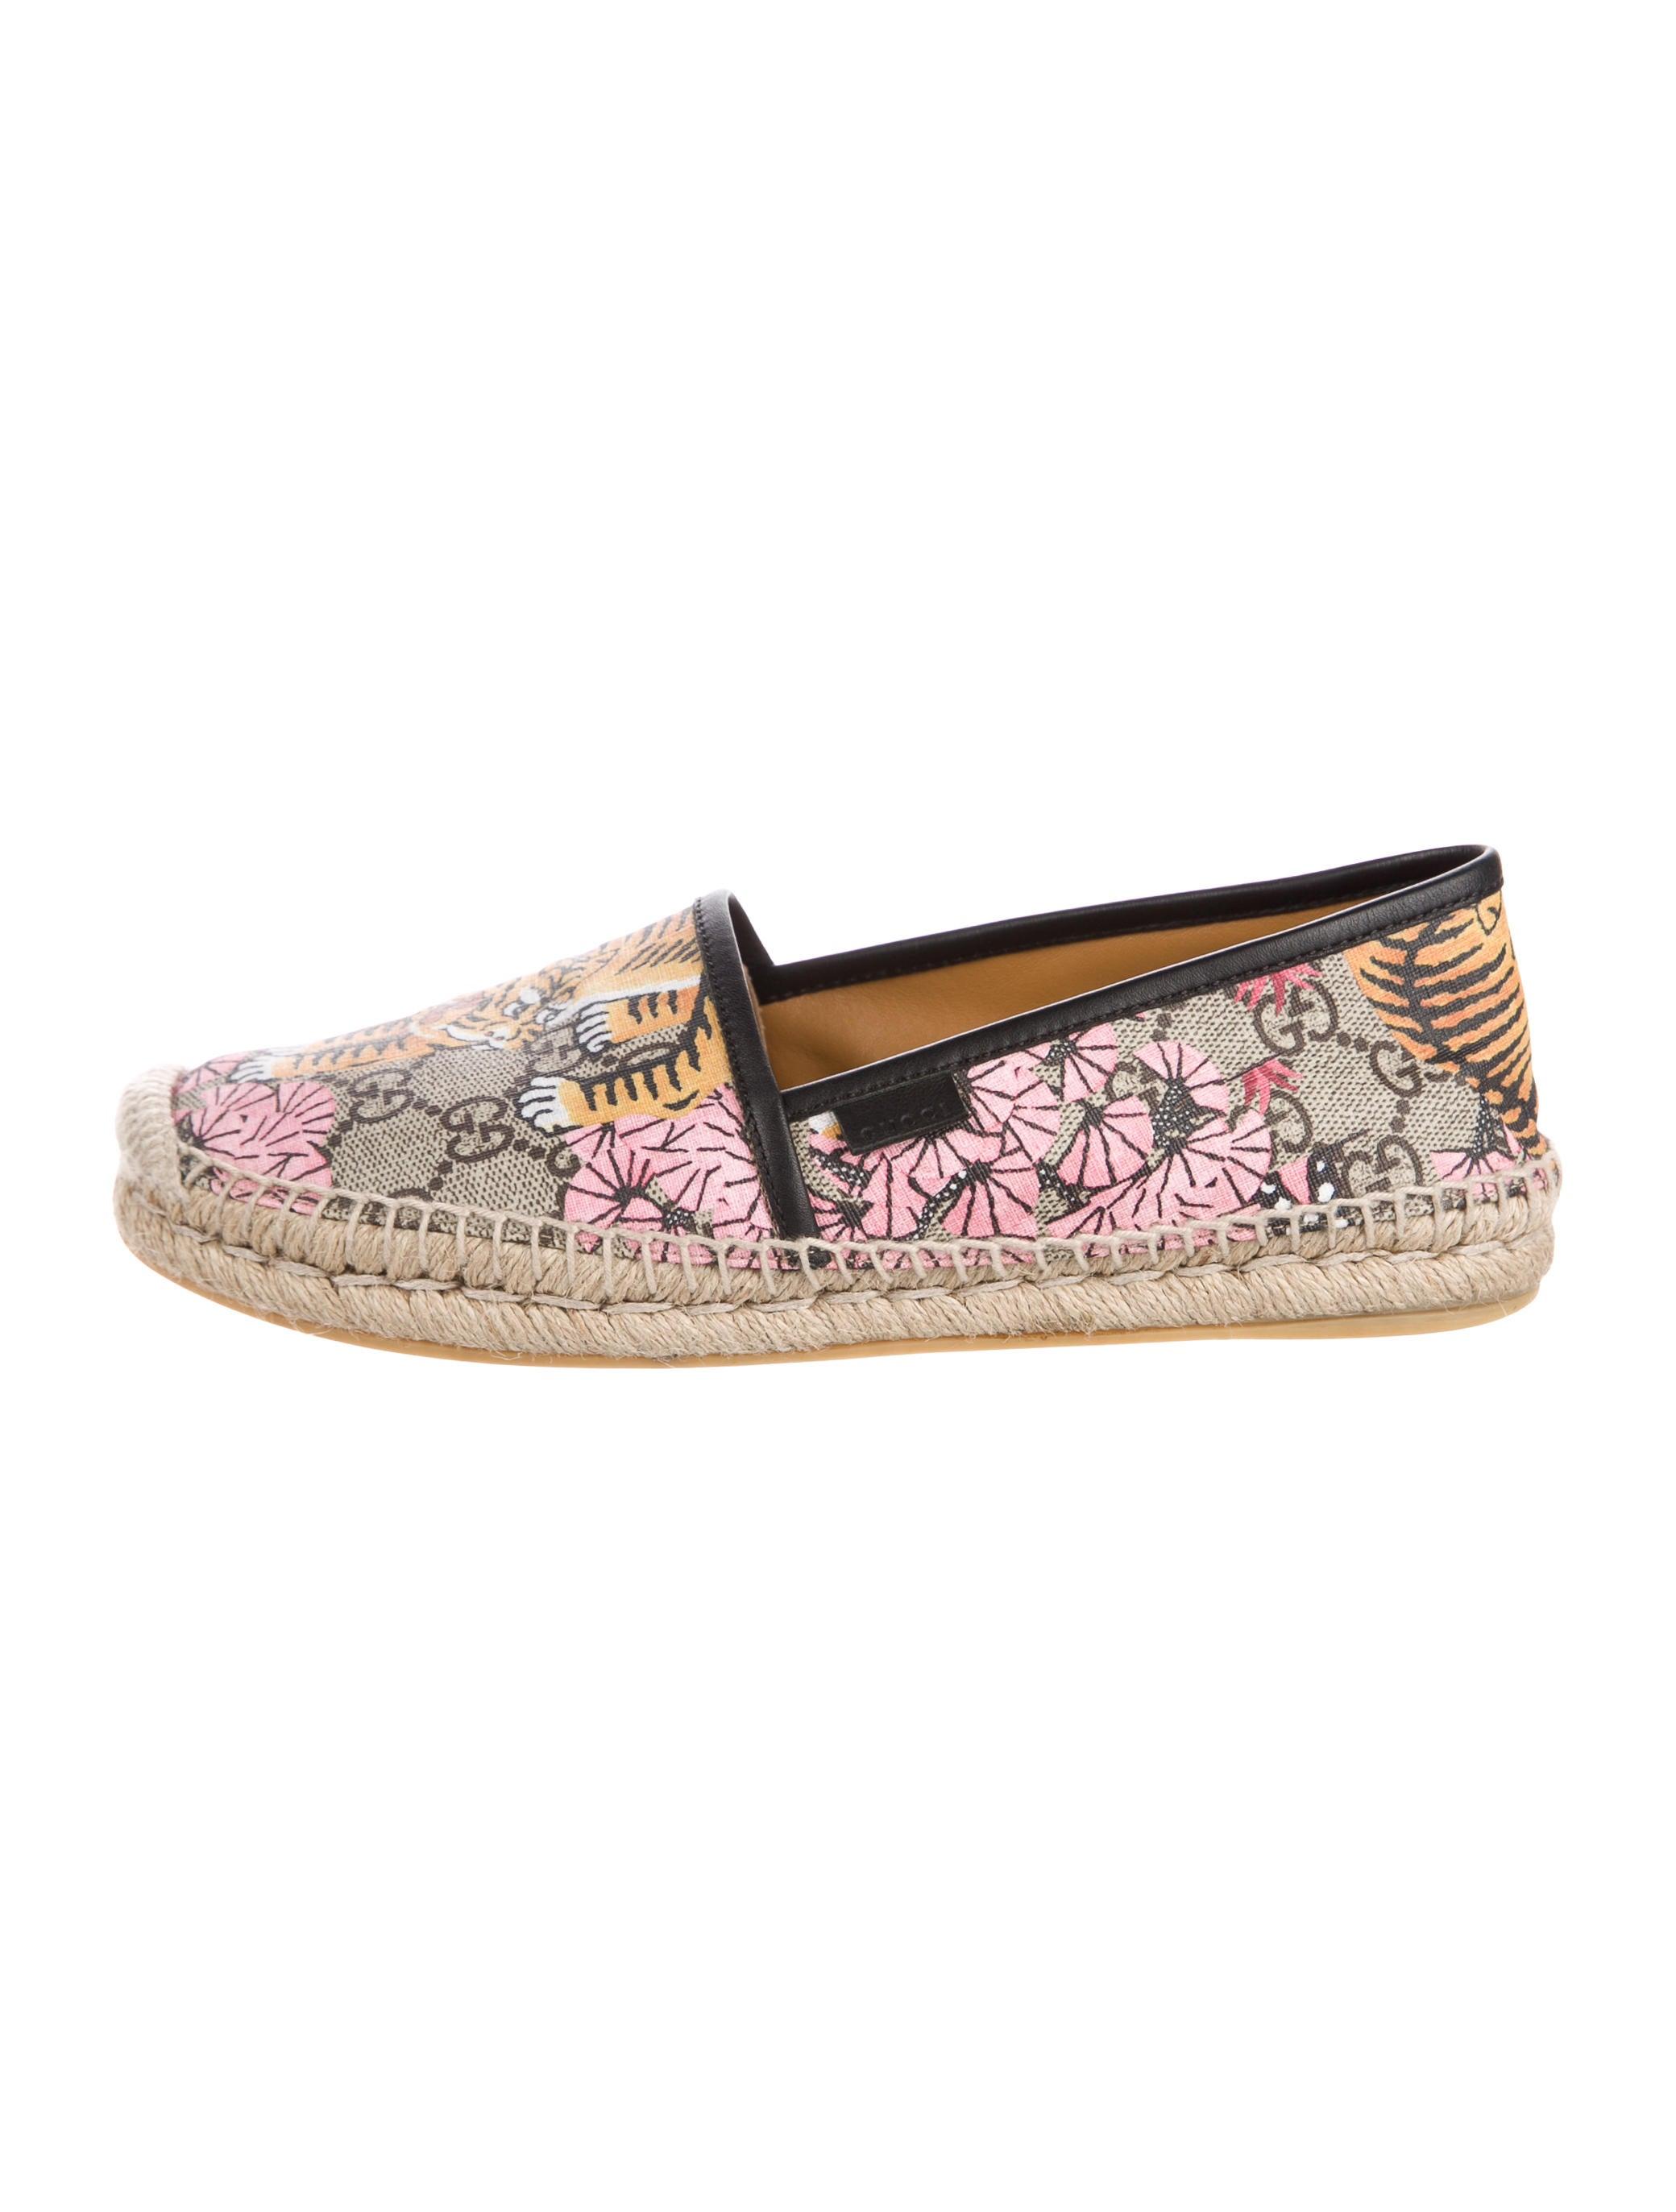 f309049313d Gucci Bengal GG Canvas Espadrilles - Shoes - GUC166524